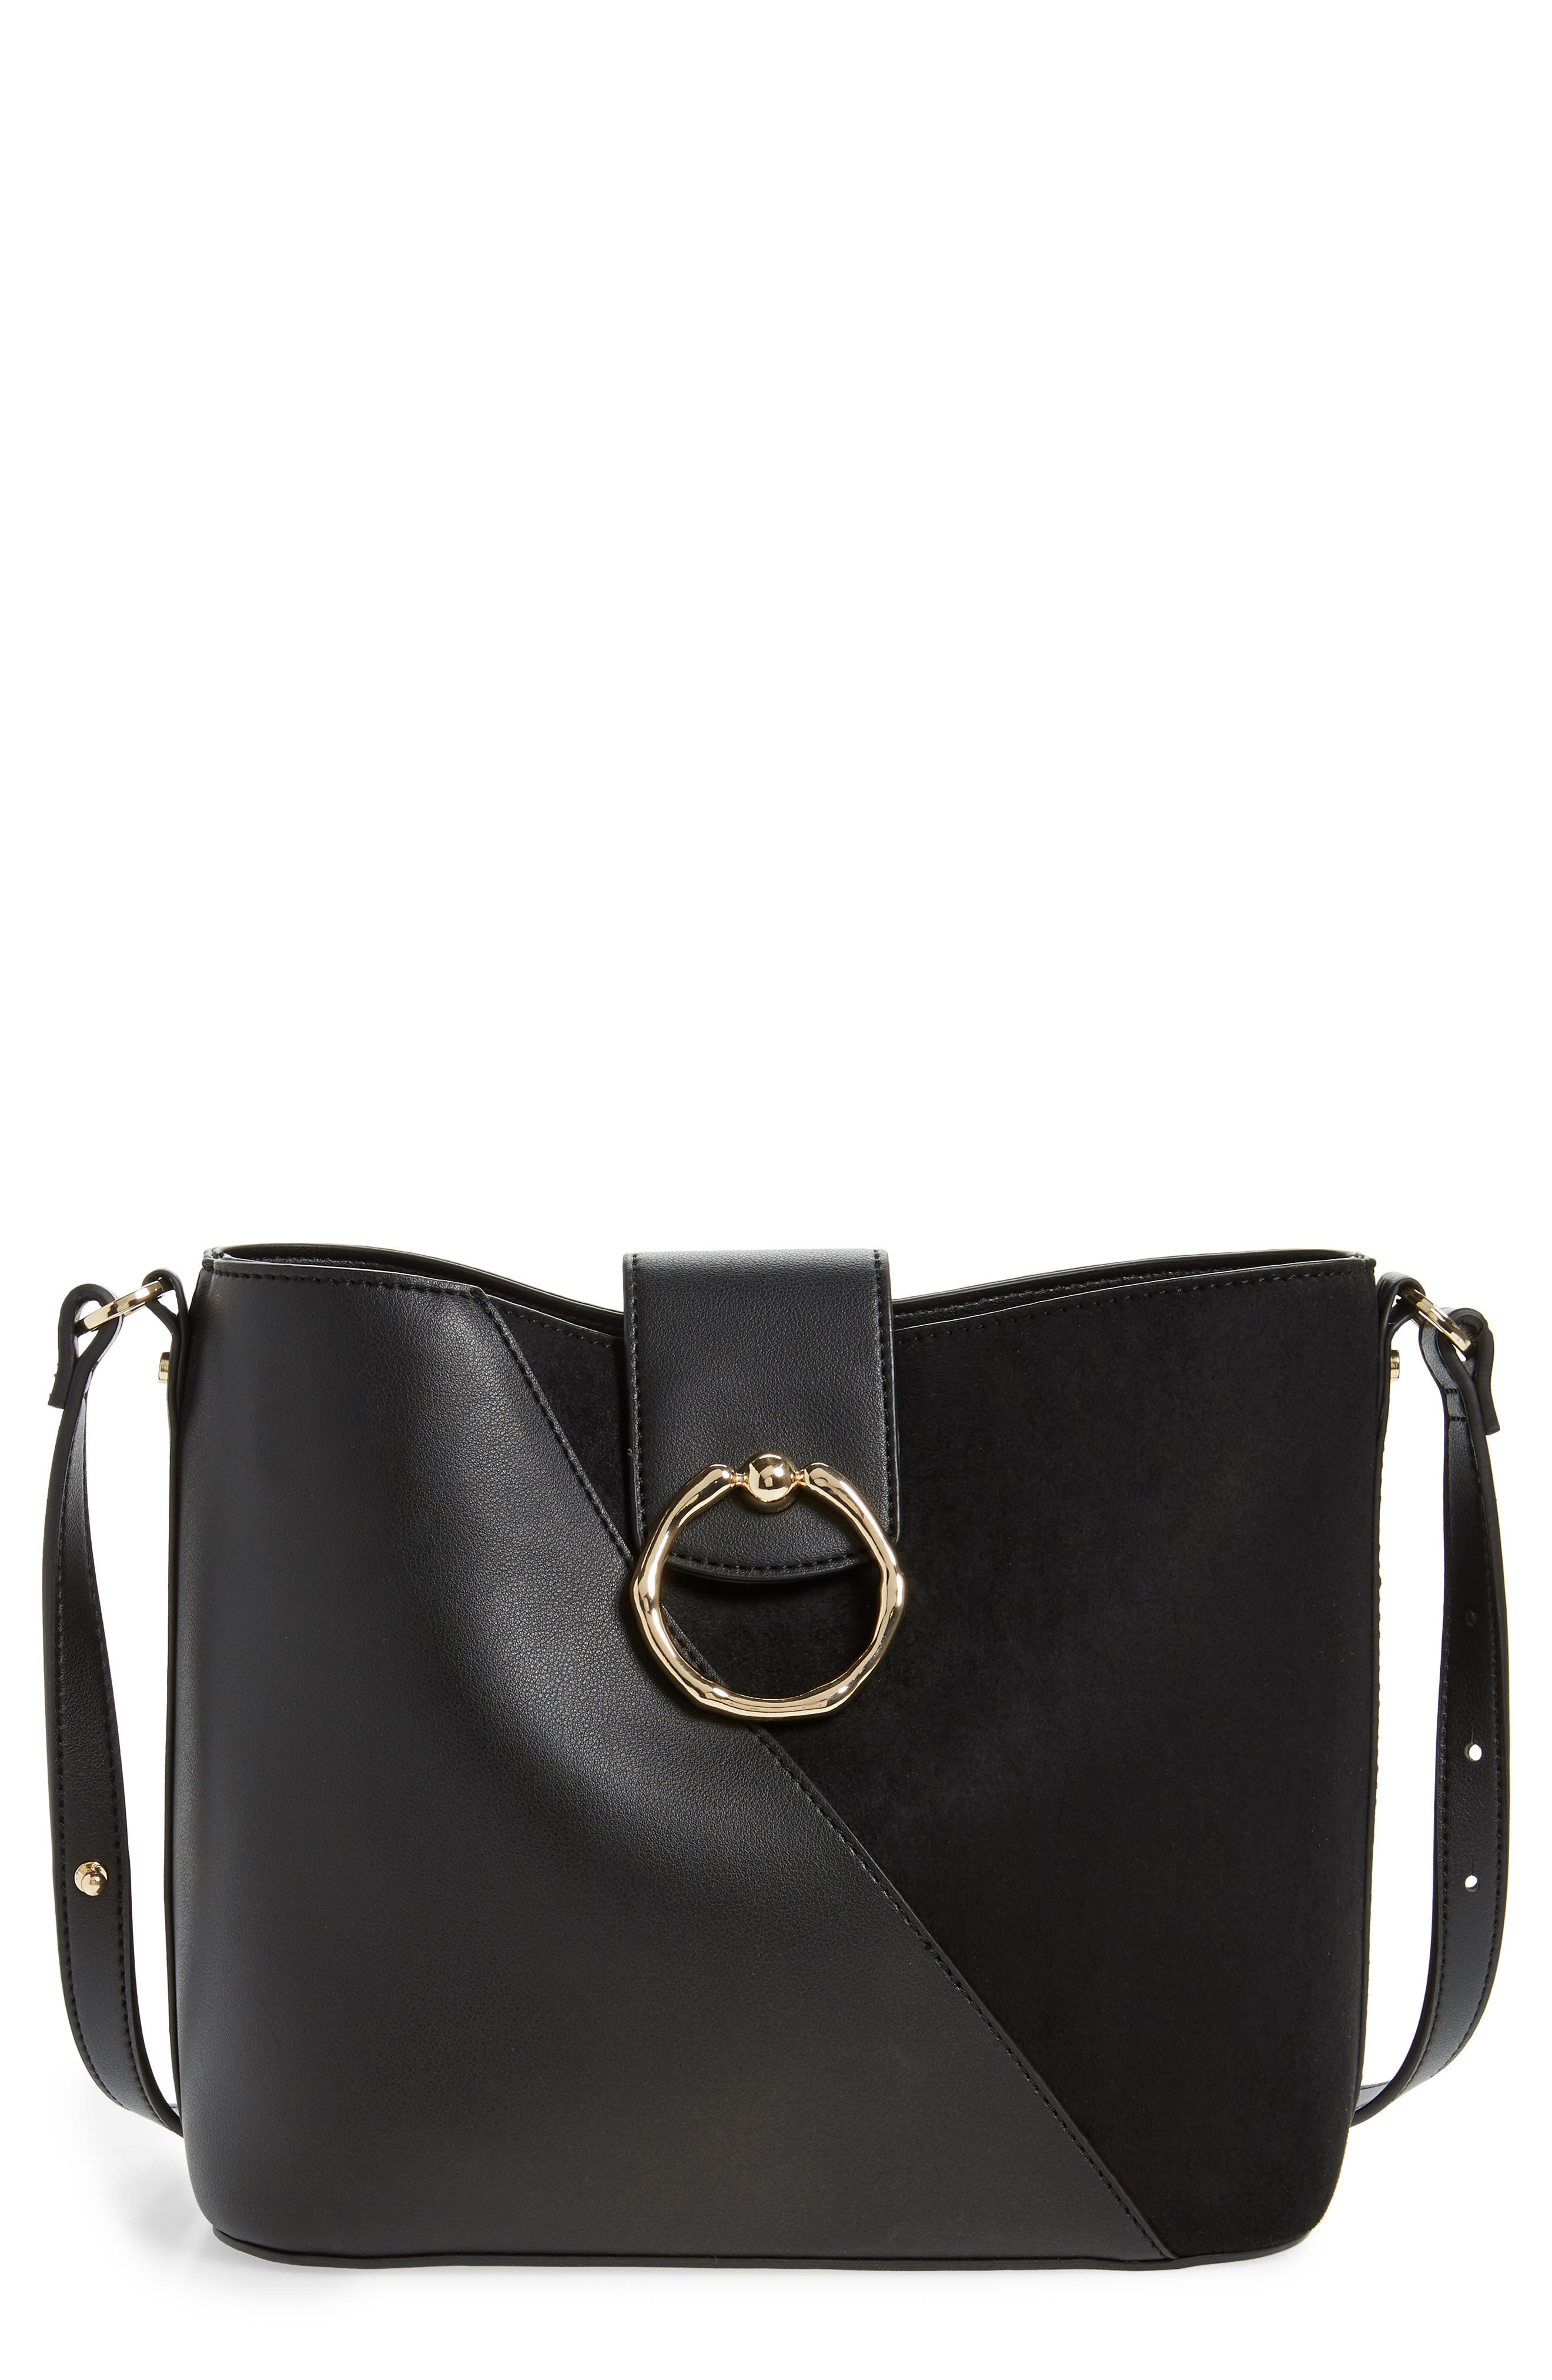 c394621377 Topshop Spark Piece Faux Leather Hobo Bag - Black